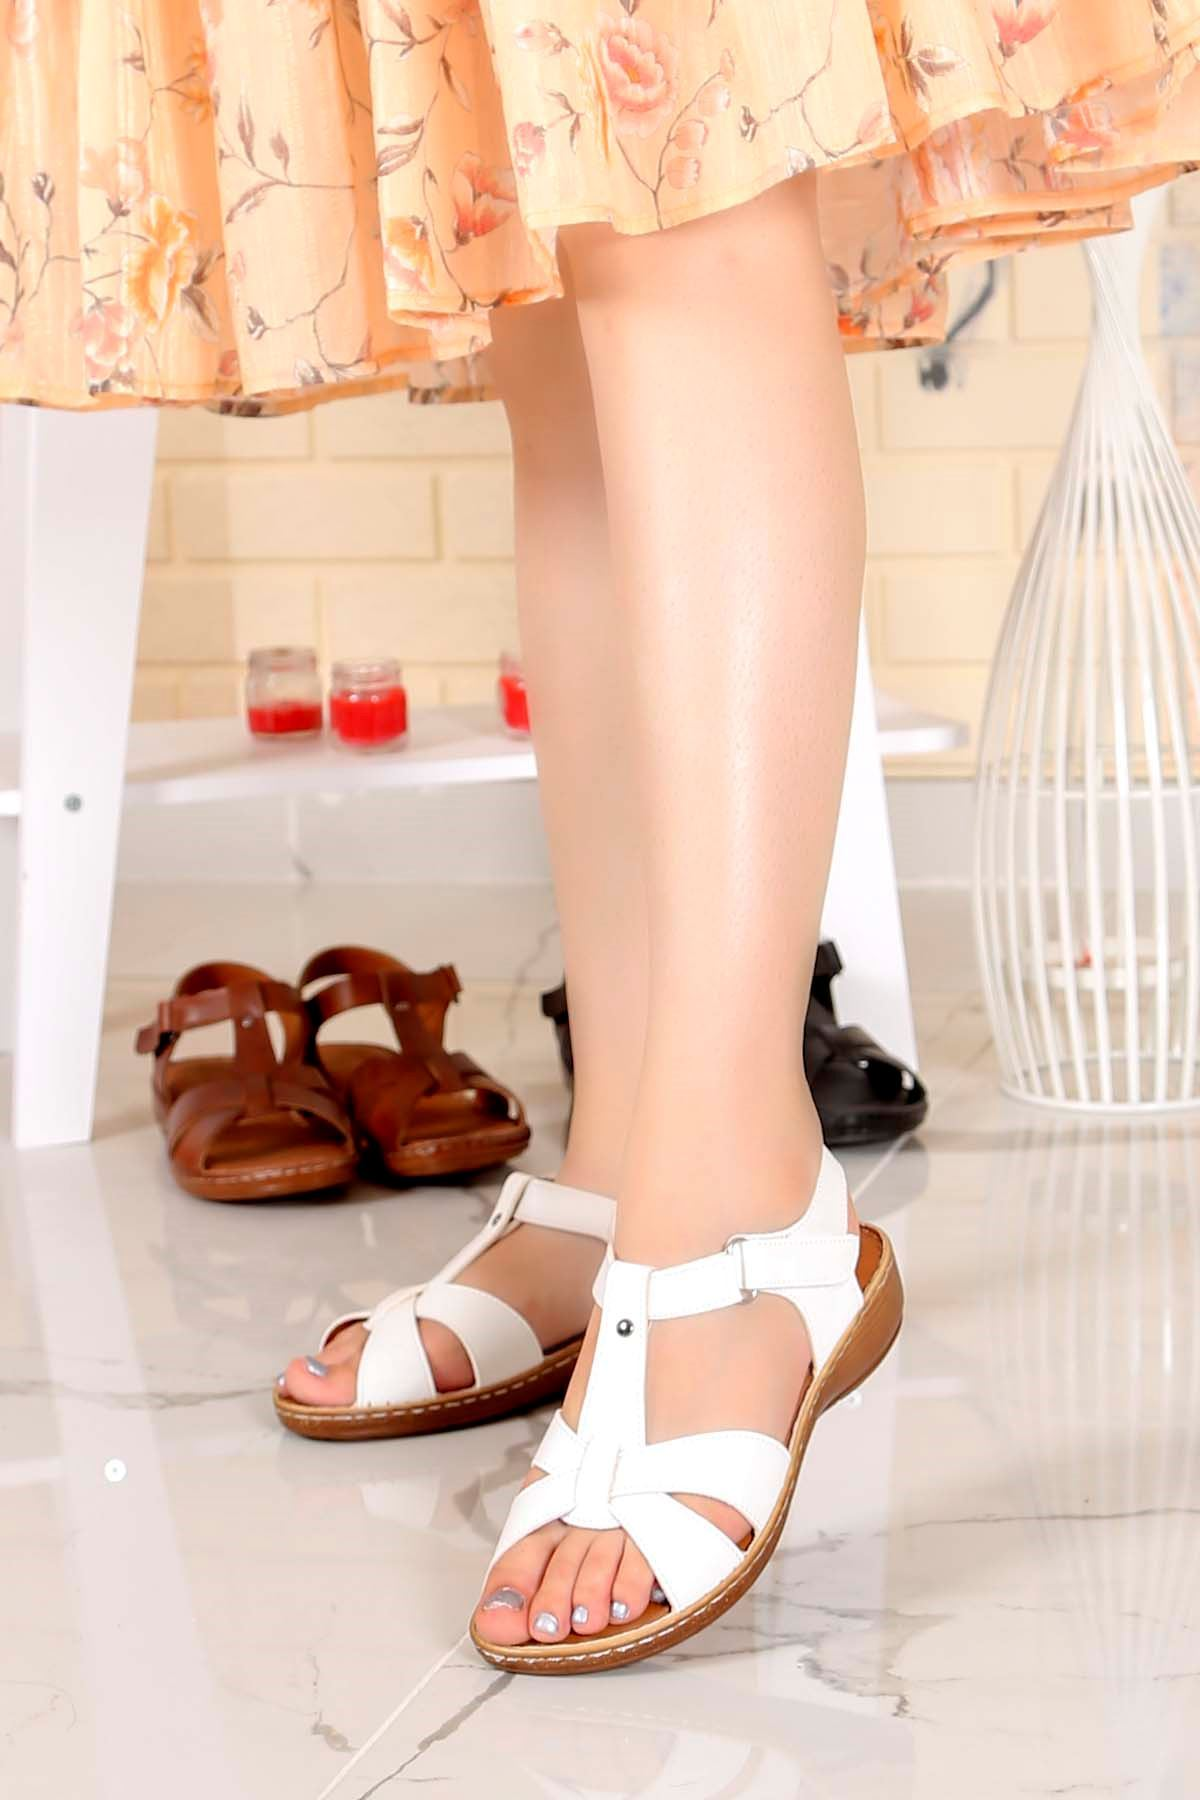 My-Fit-701 Konfor Sandalet Beyaz Deri